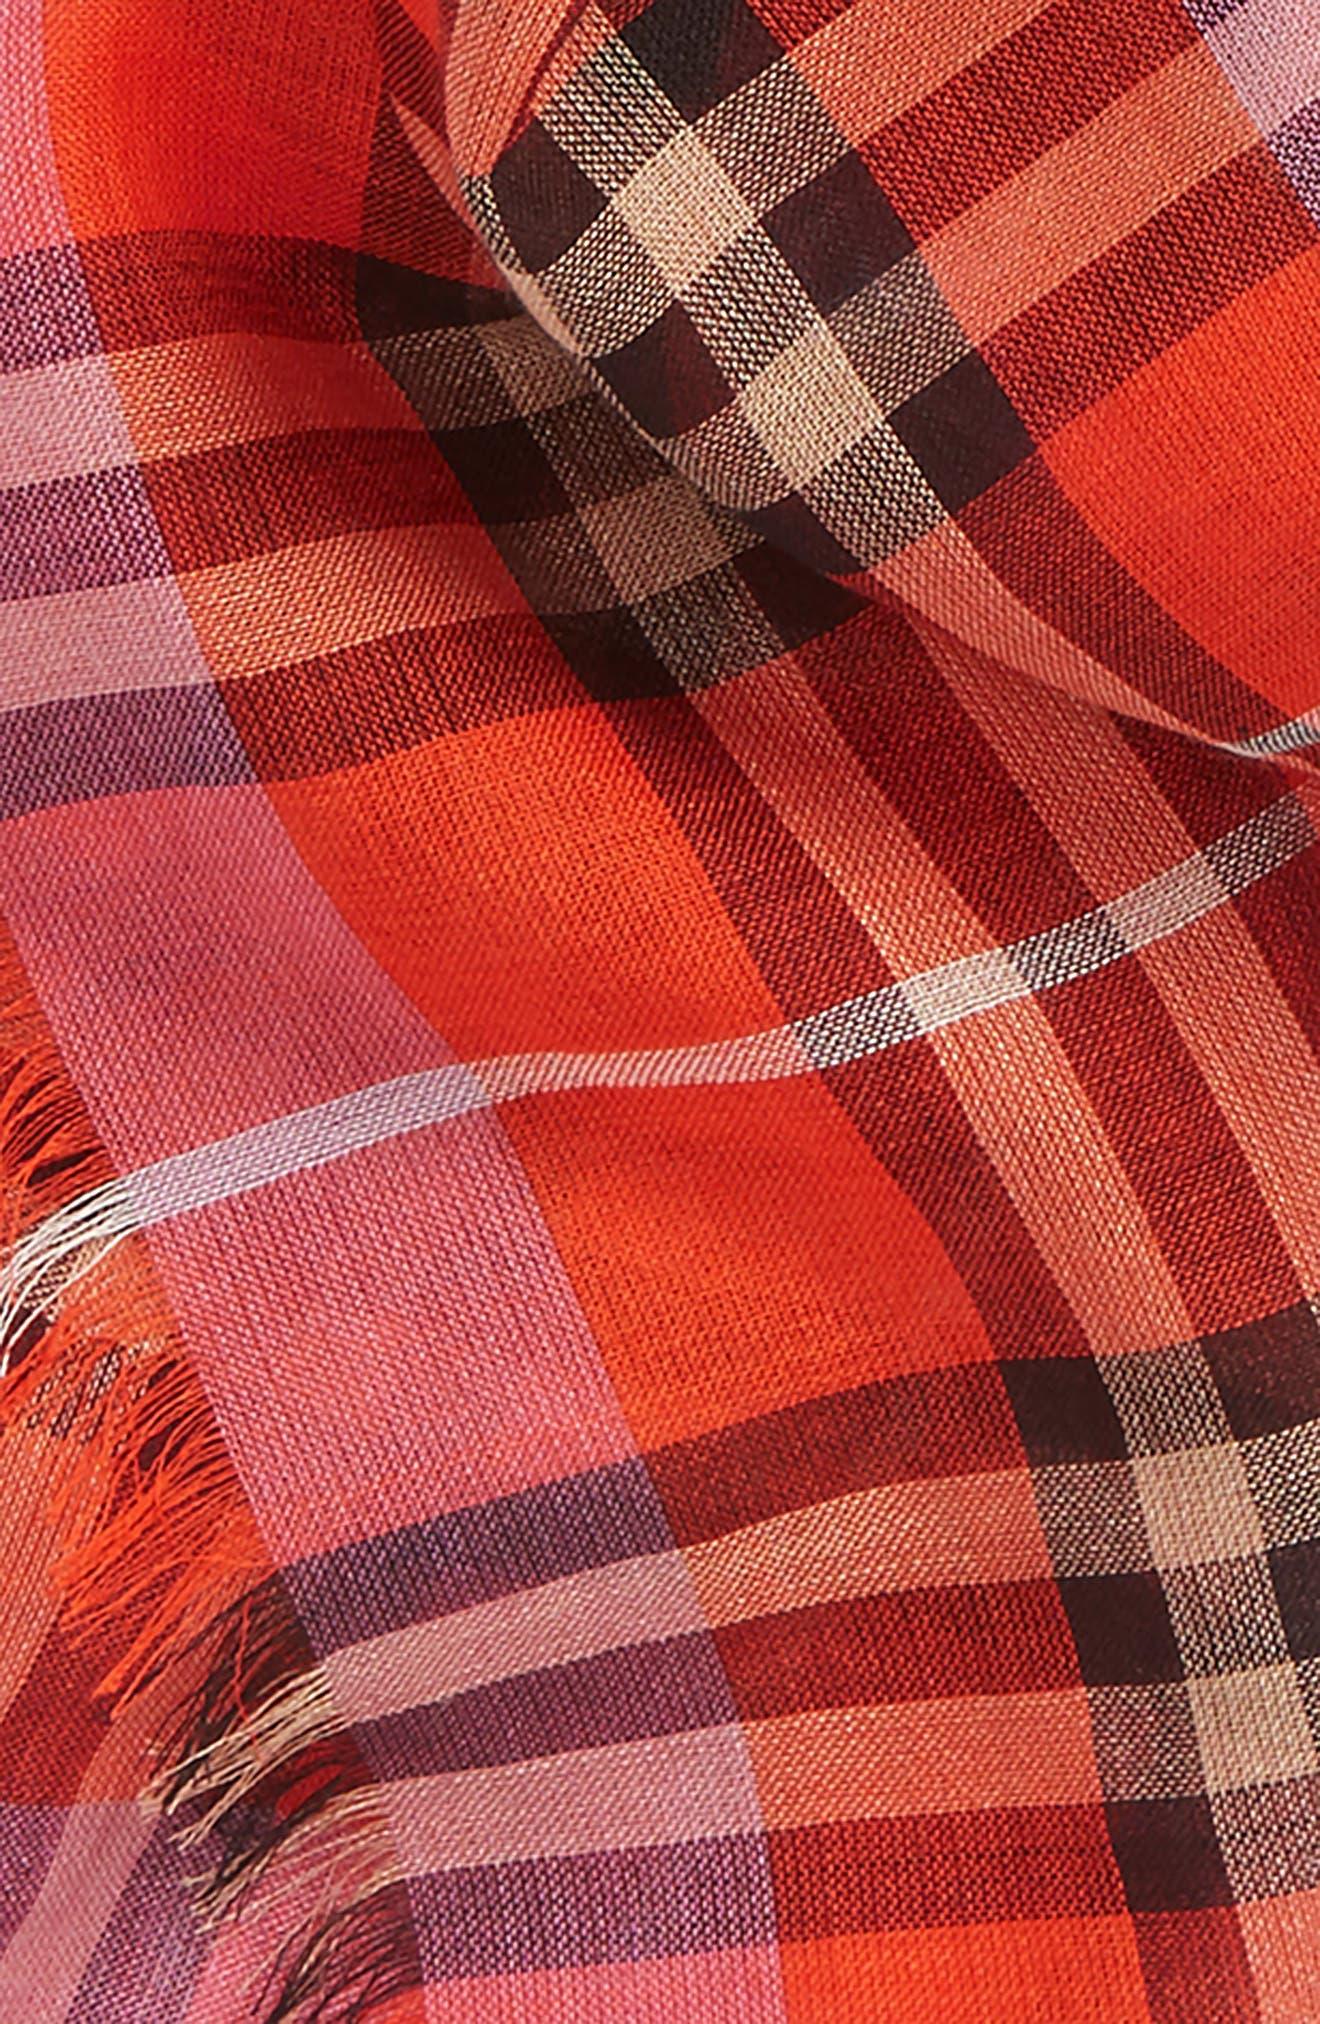 Vintage Check Wool & Silk Blend Scarf,                             Alternate thumbnail 3, color,